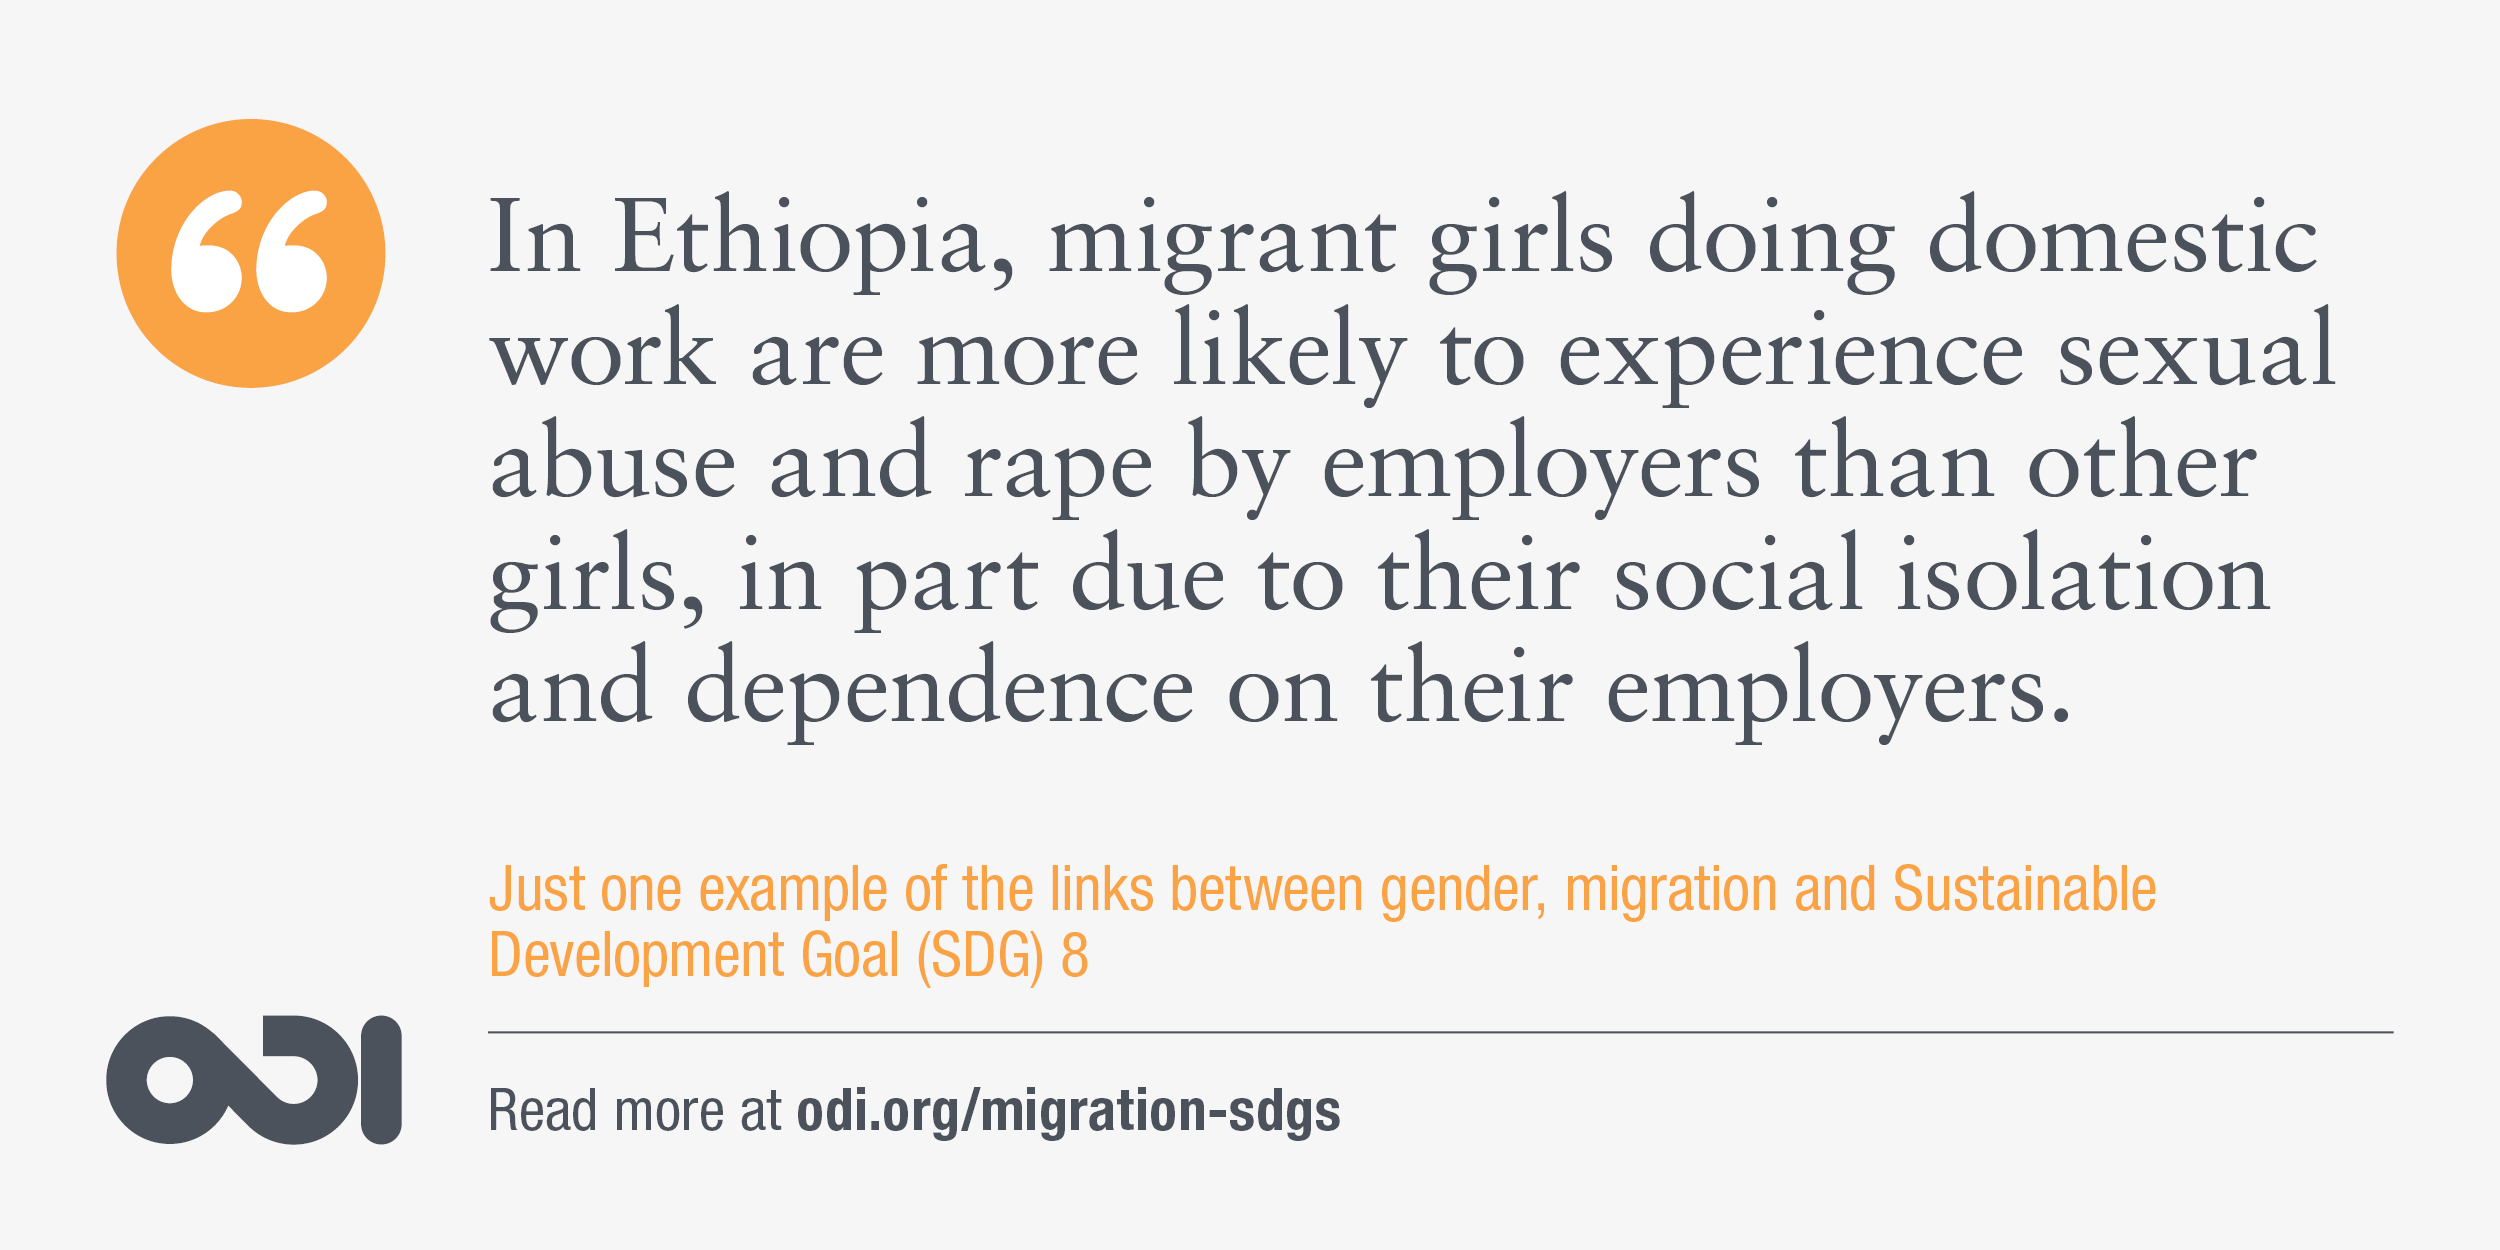 The links between gender, migration and SDG 8.